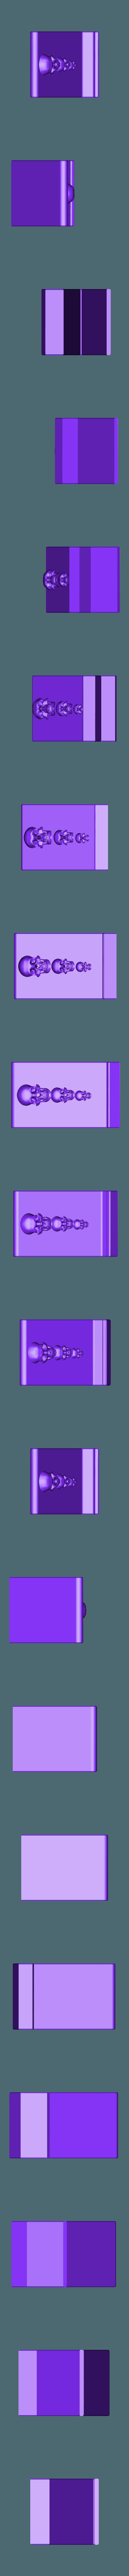 3-Cranio-Final.stl Download STL file Smartphone Support Skull • Design to 3D print, BrunoLopes